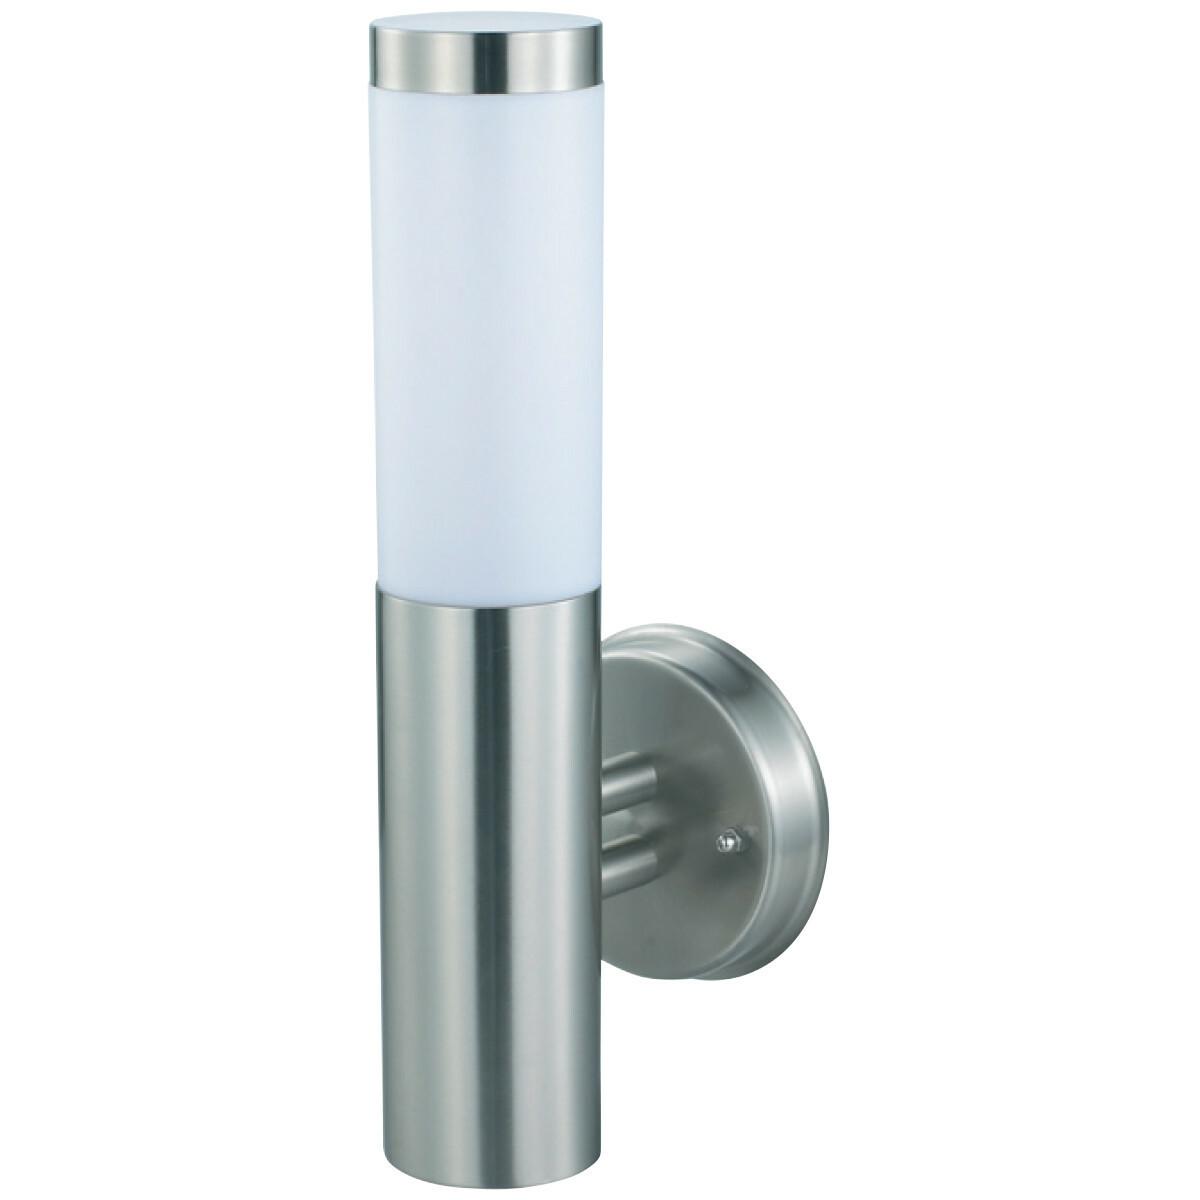 PHILIPS - LED Tuinverlichting - Wandlamp Buiten - CorePro Lustre 827 P45 FR - Laurea 2 - E27 Fitting